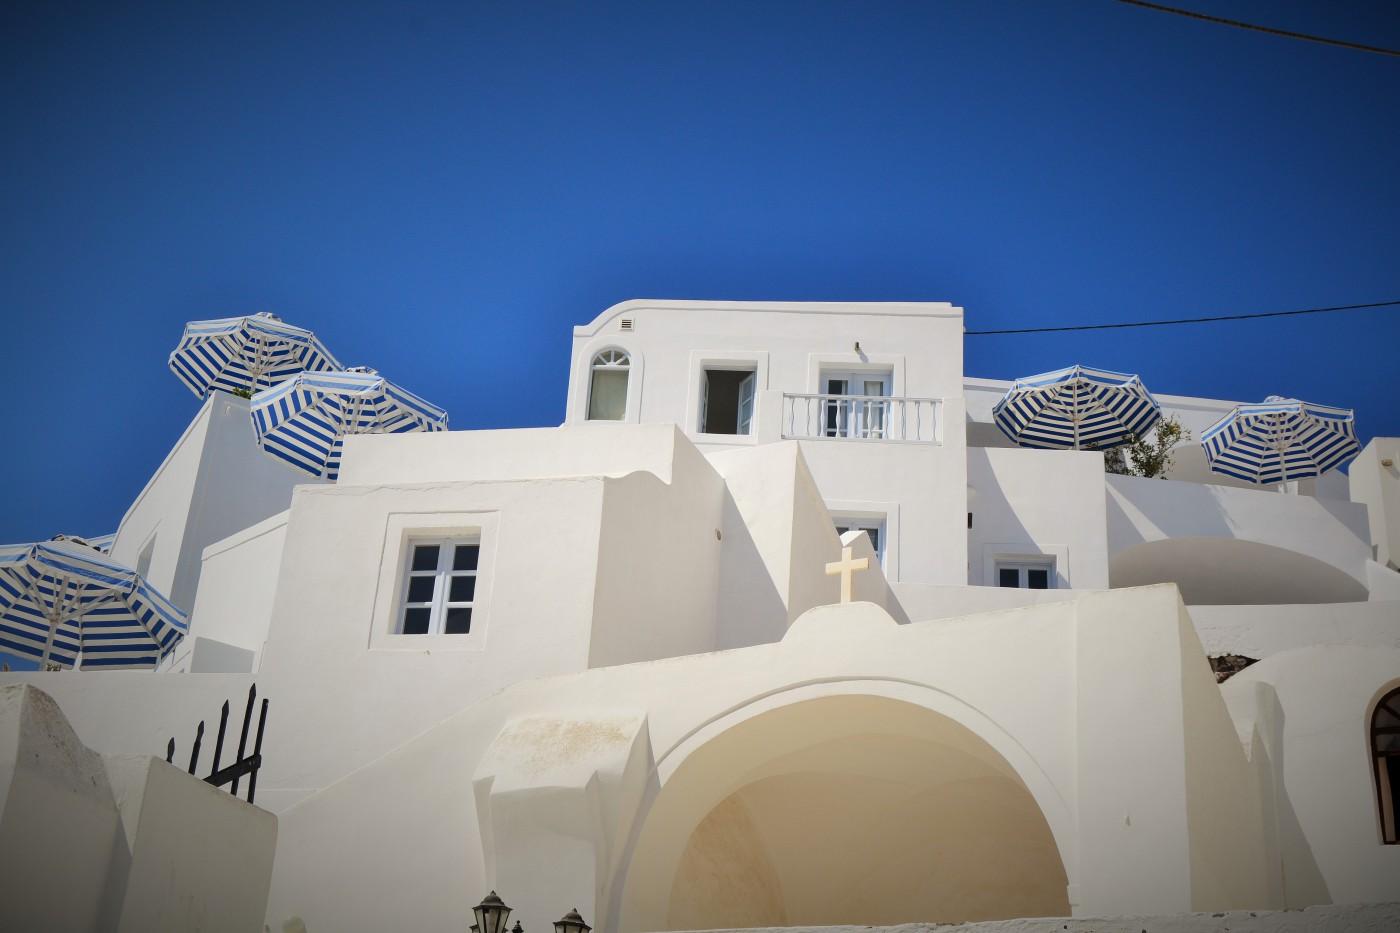 Santorini Architektur Copyright S. Schaeffer